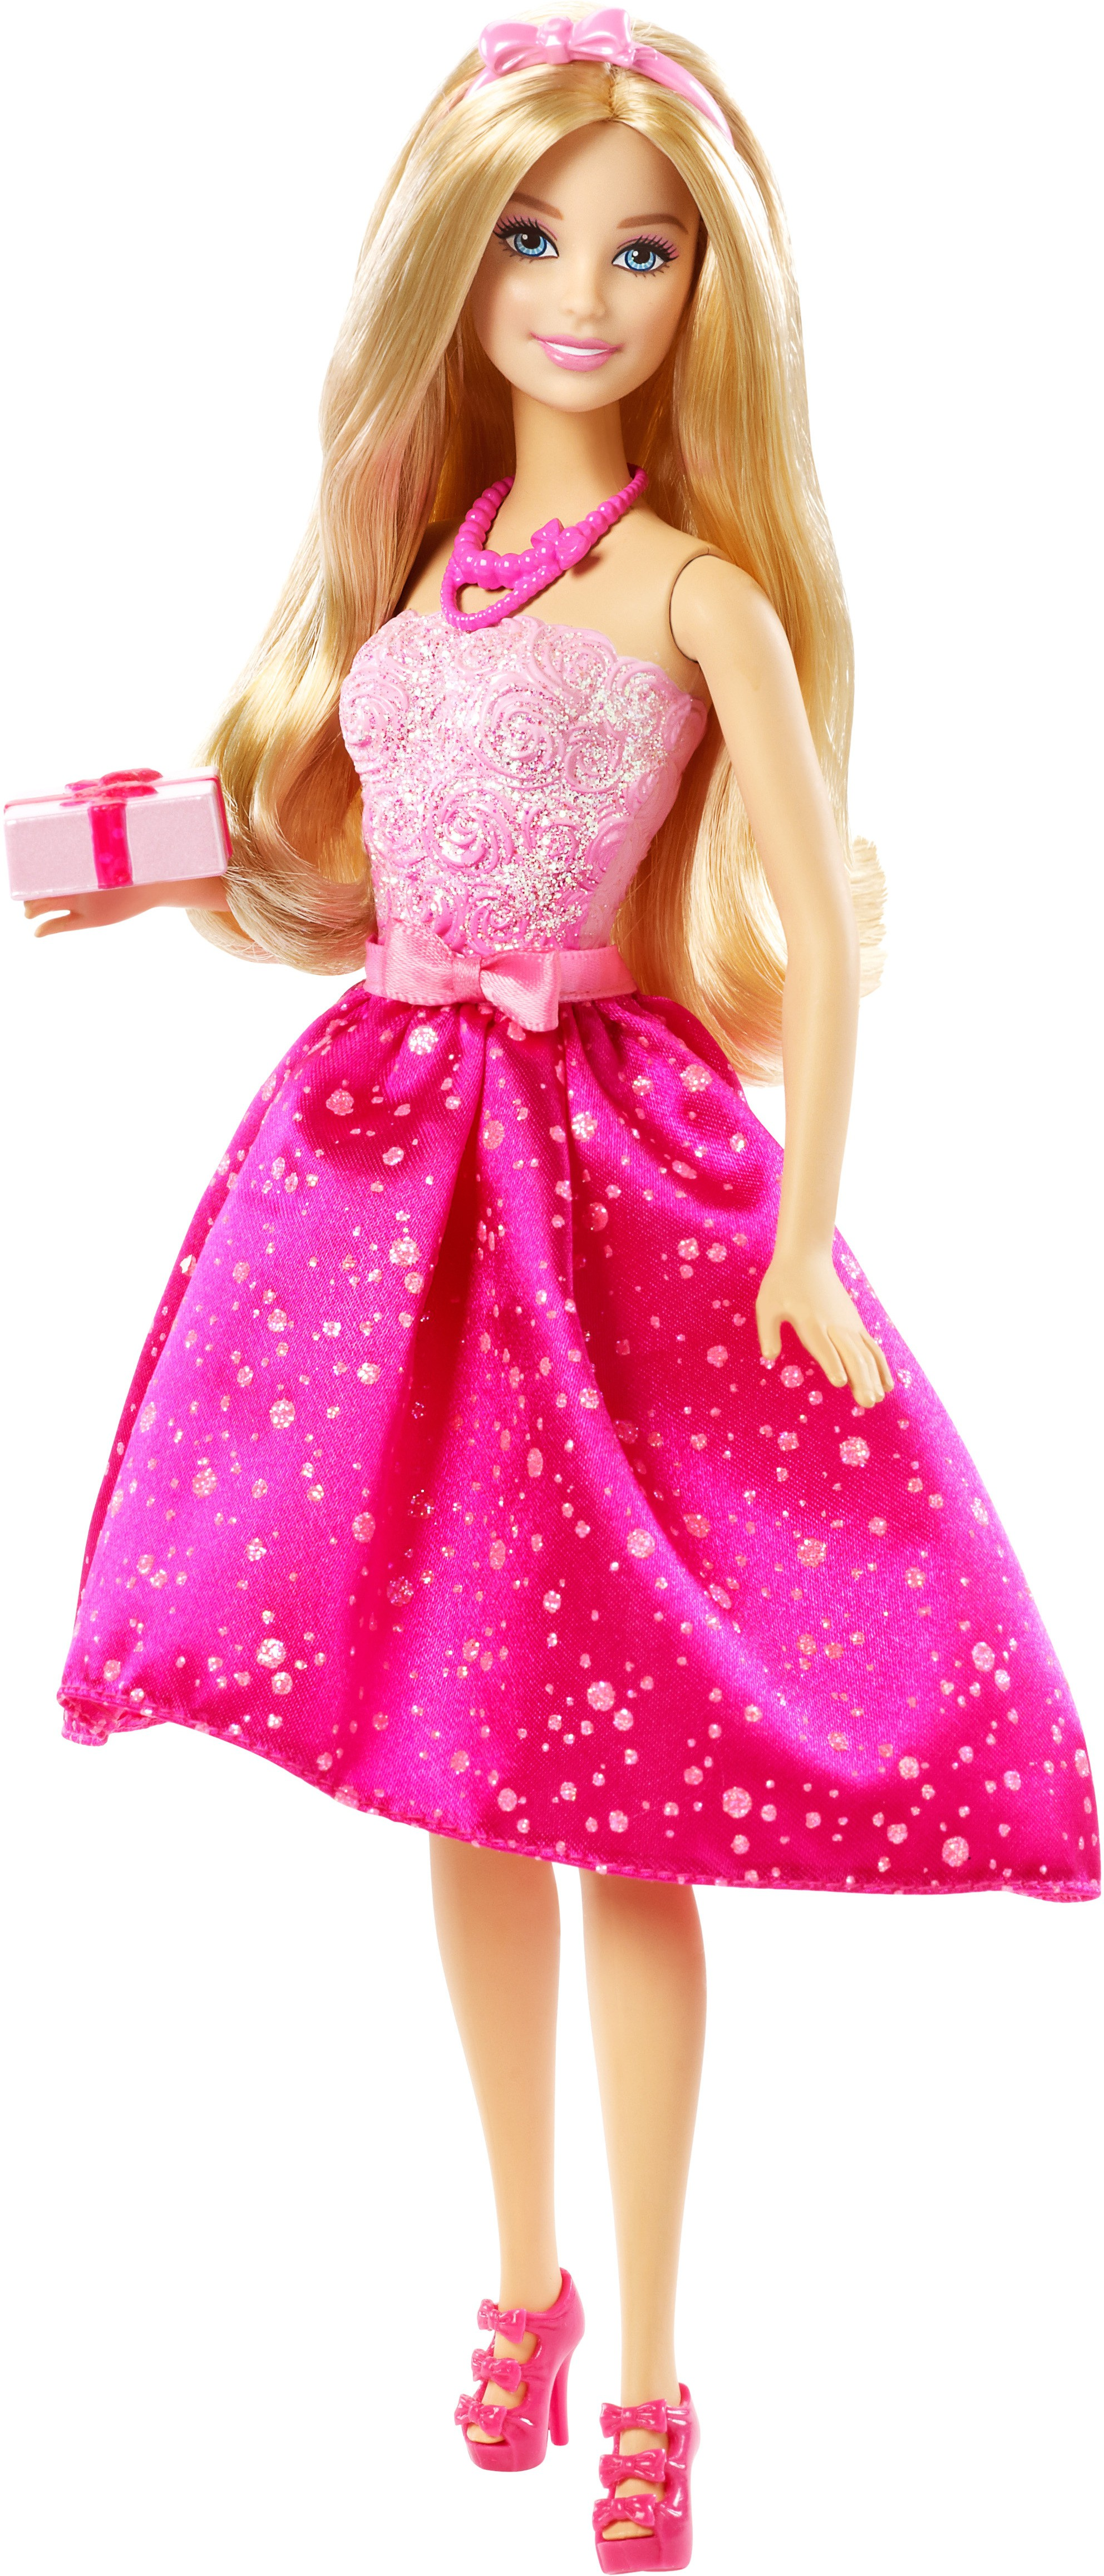 Flipkart - Barbie, Lego, Funskool... Toys & School Bags